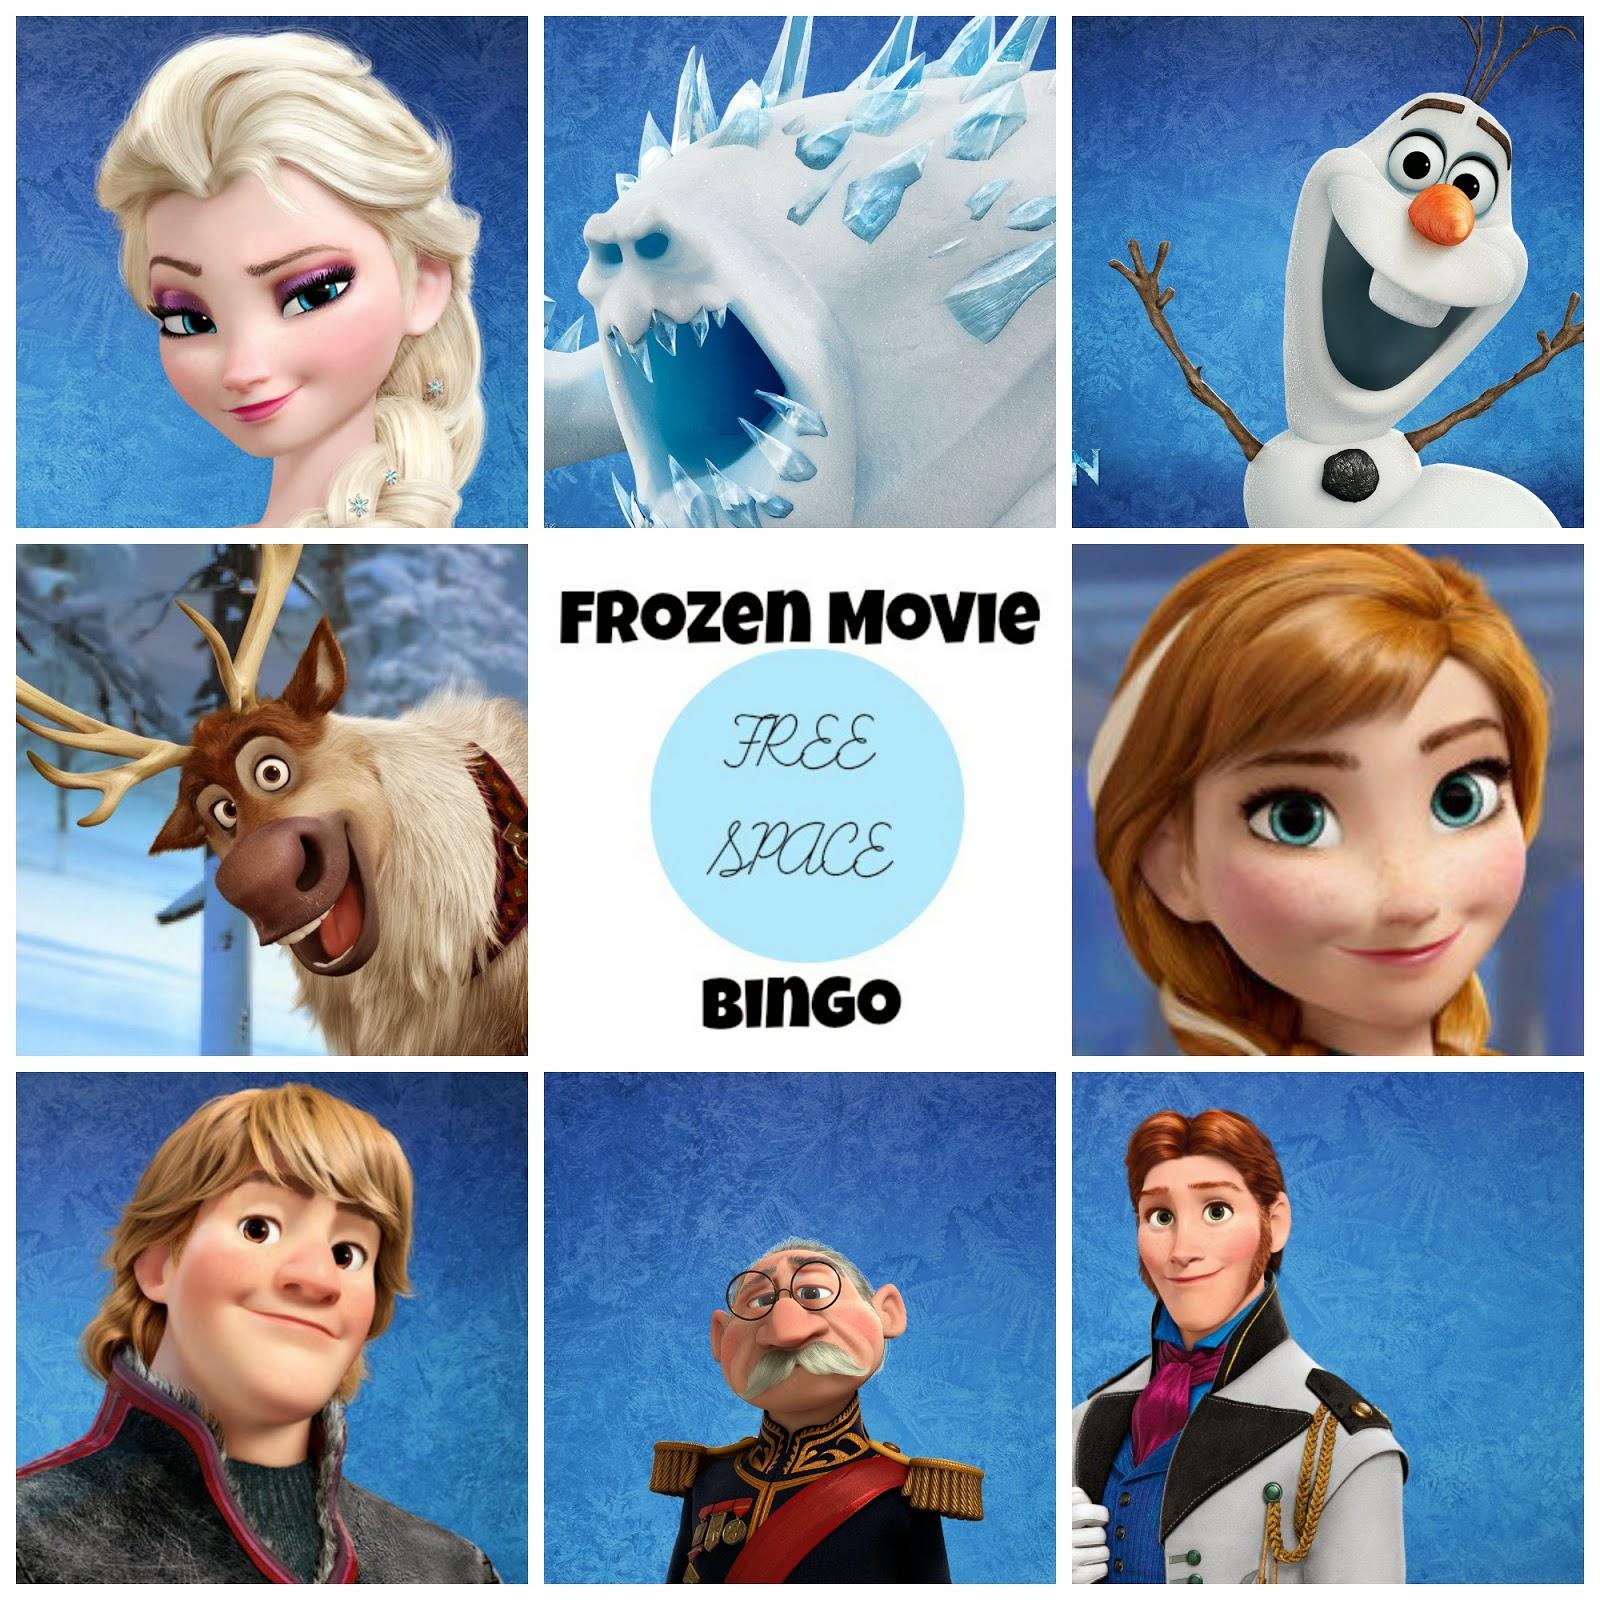 Frozen Free Printable Bingo. - Oh My Fiesta! In English